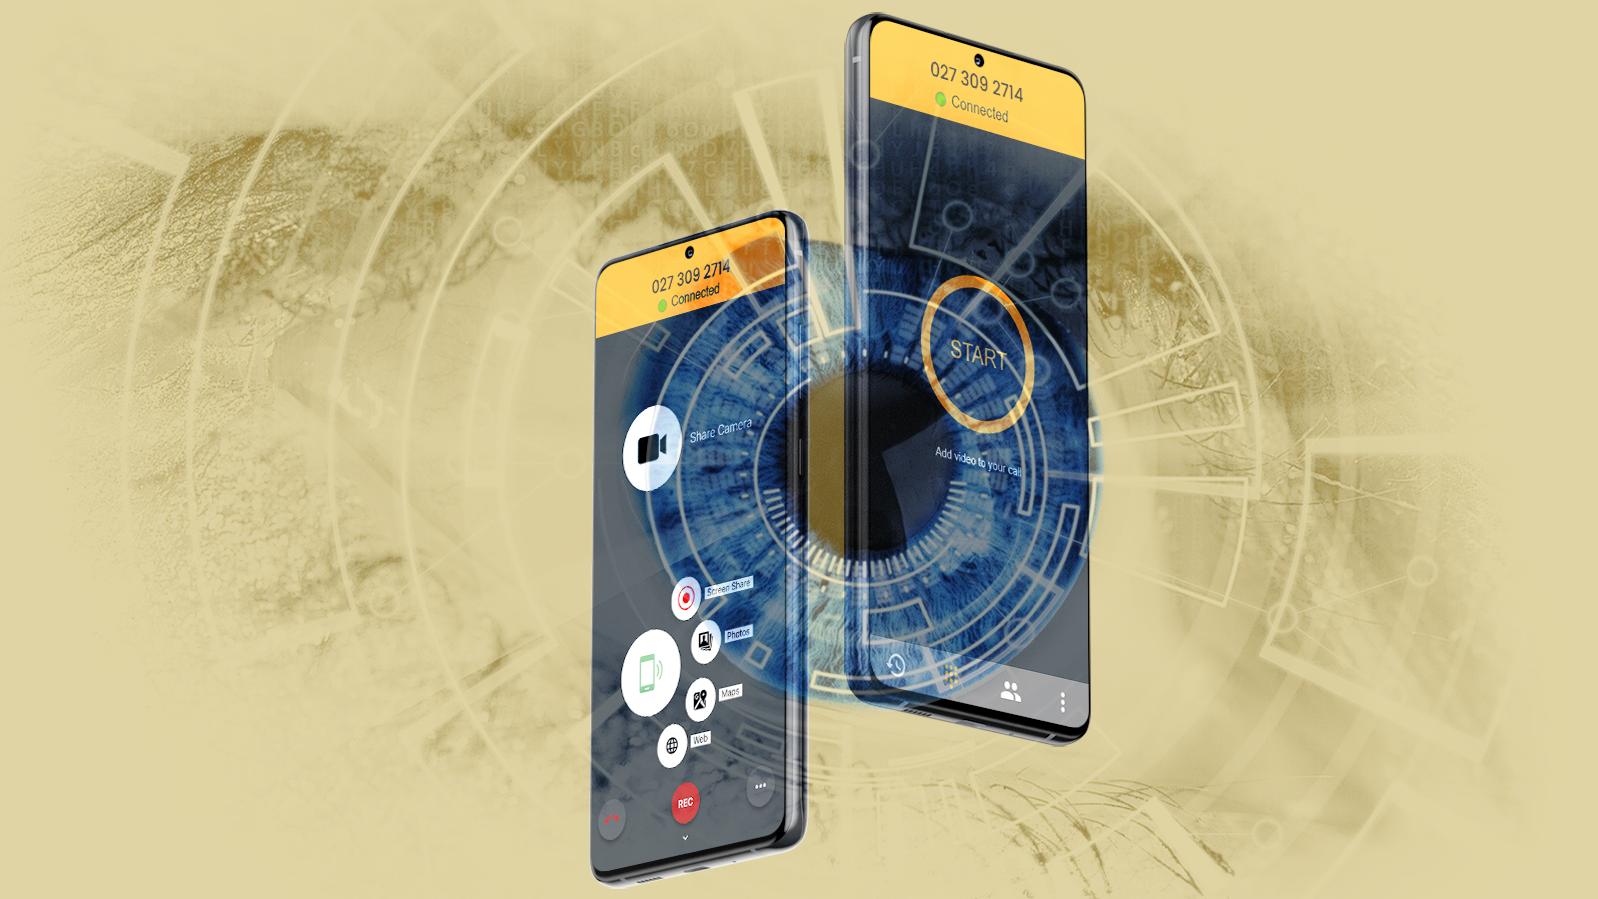 Zyte - Virtual Inspection and Assistance Platform.